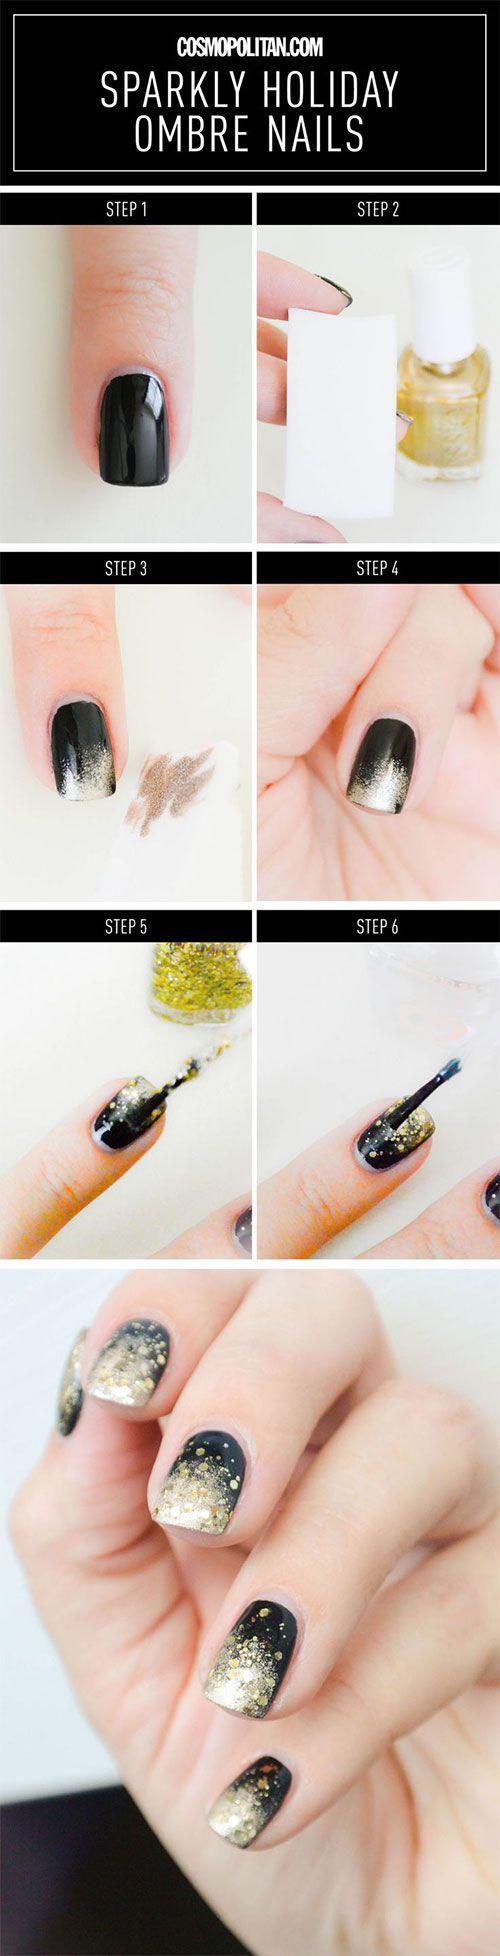 Best 25 Nail Techniques Ideas On Pinterest Nail Art